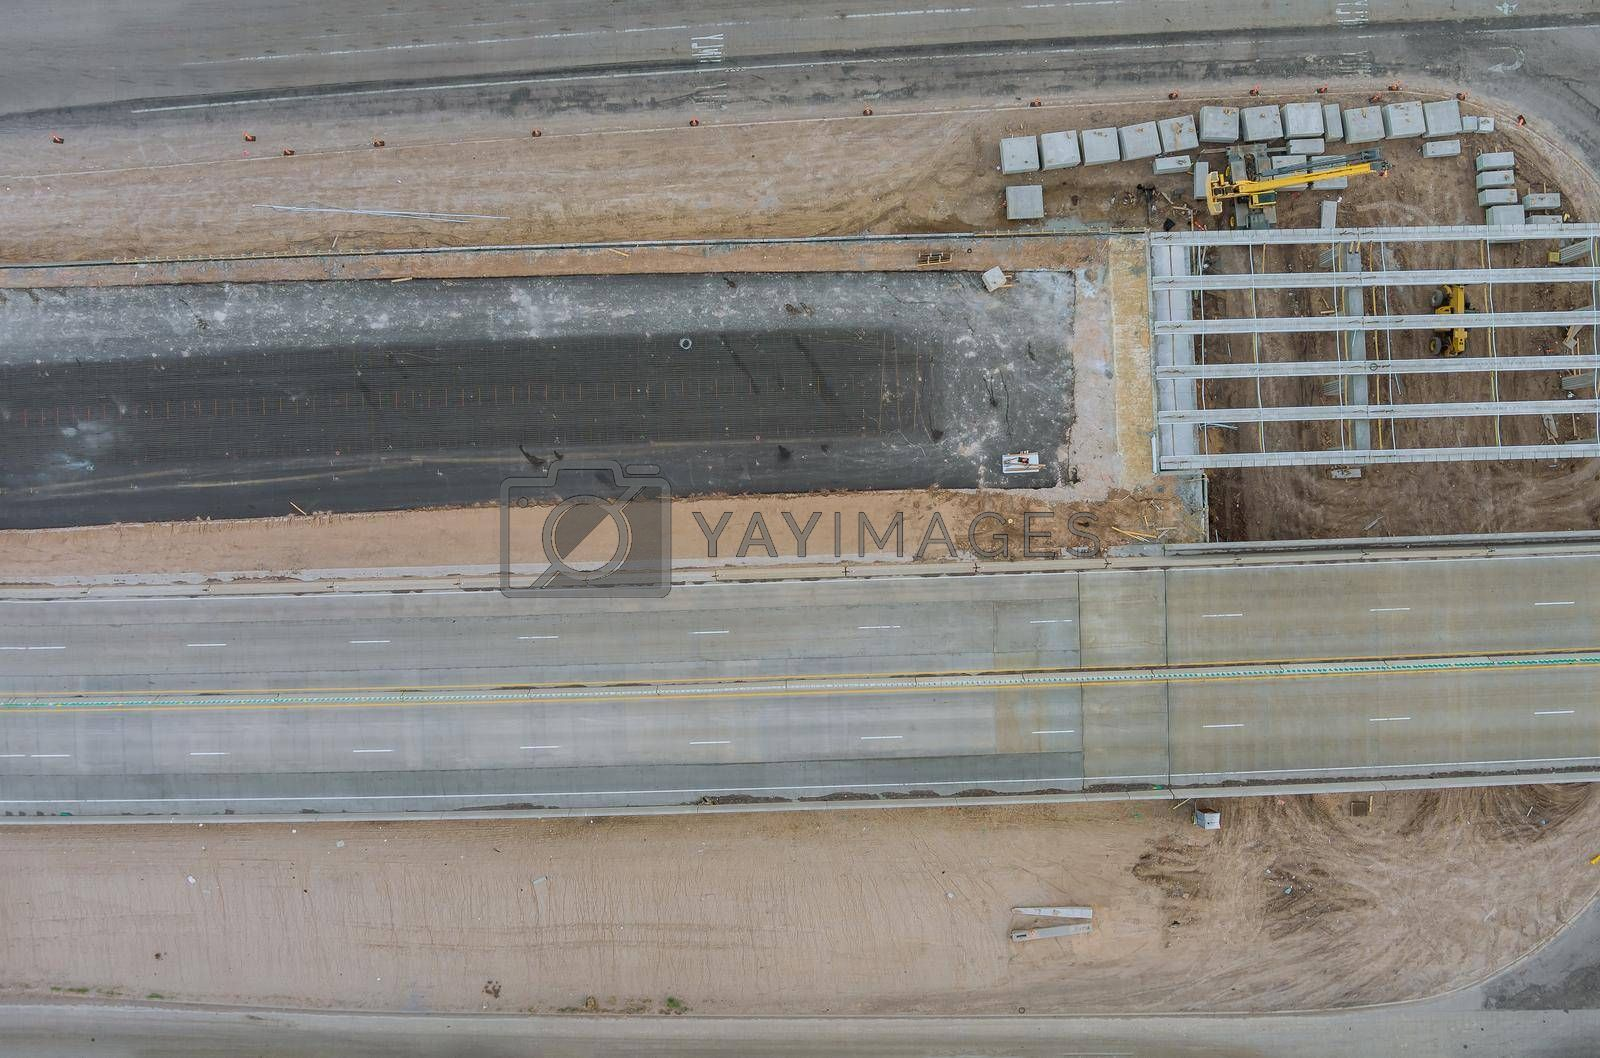 Renovation bridge construction site on reconstruction of the bridge of a modern road interchange in US